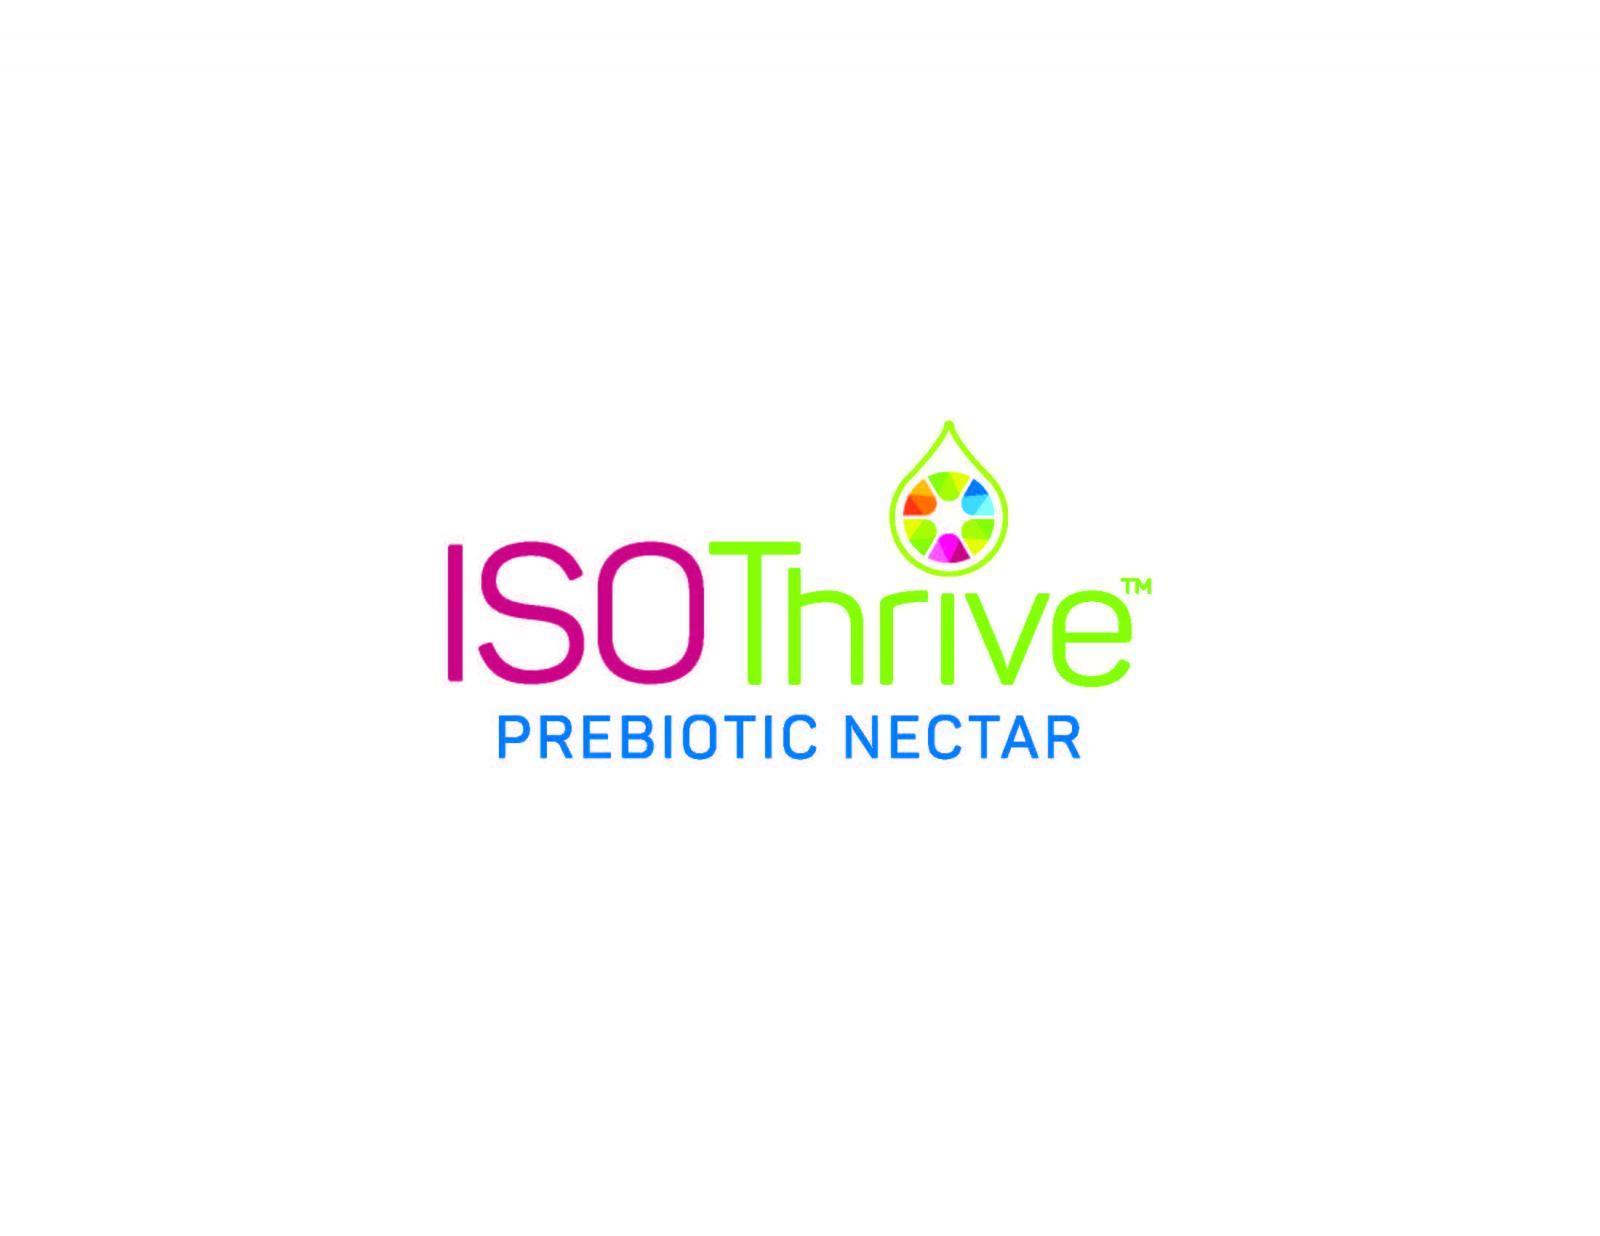 ISOThrive's logo